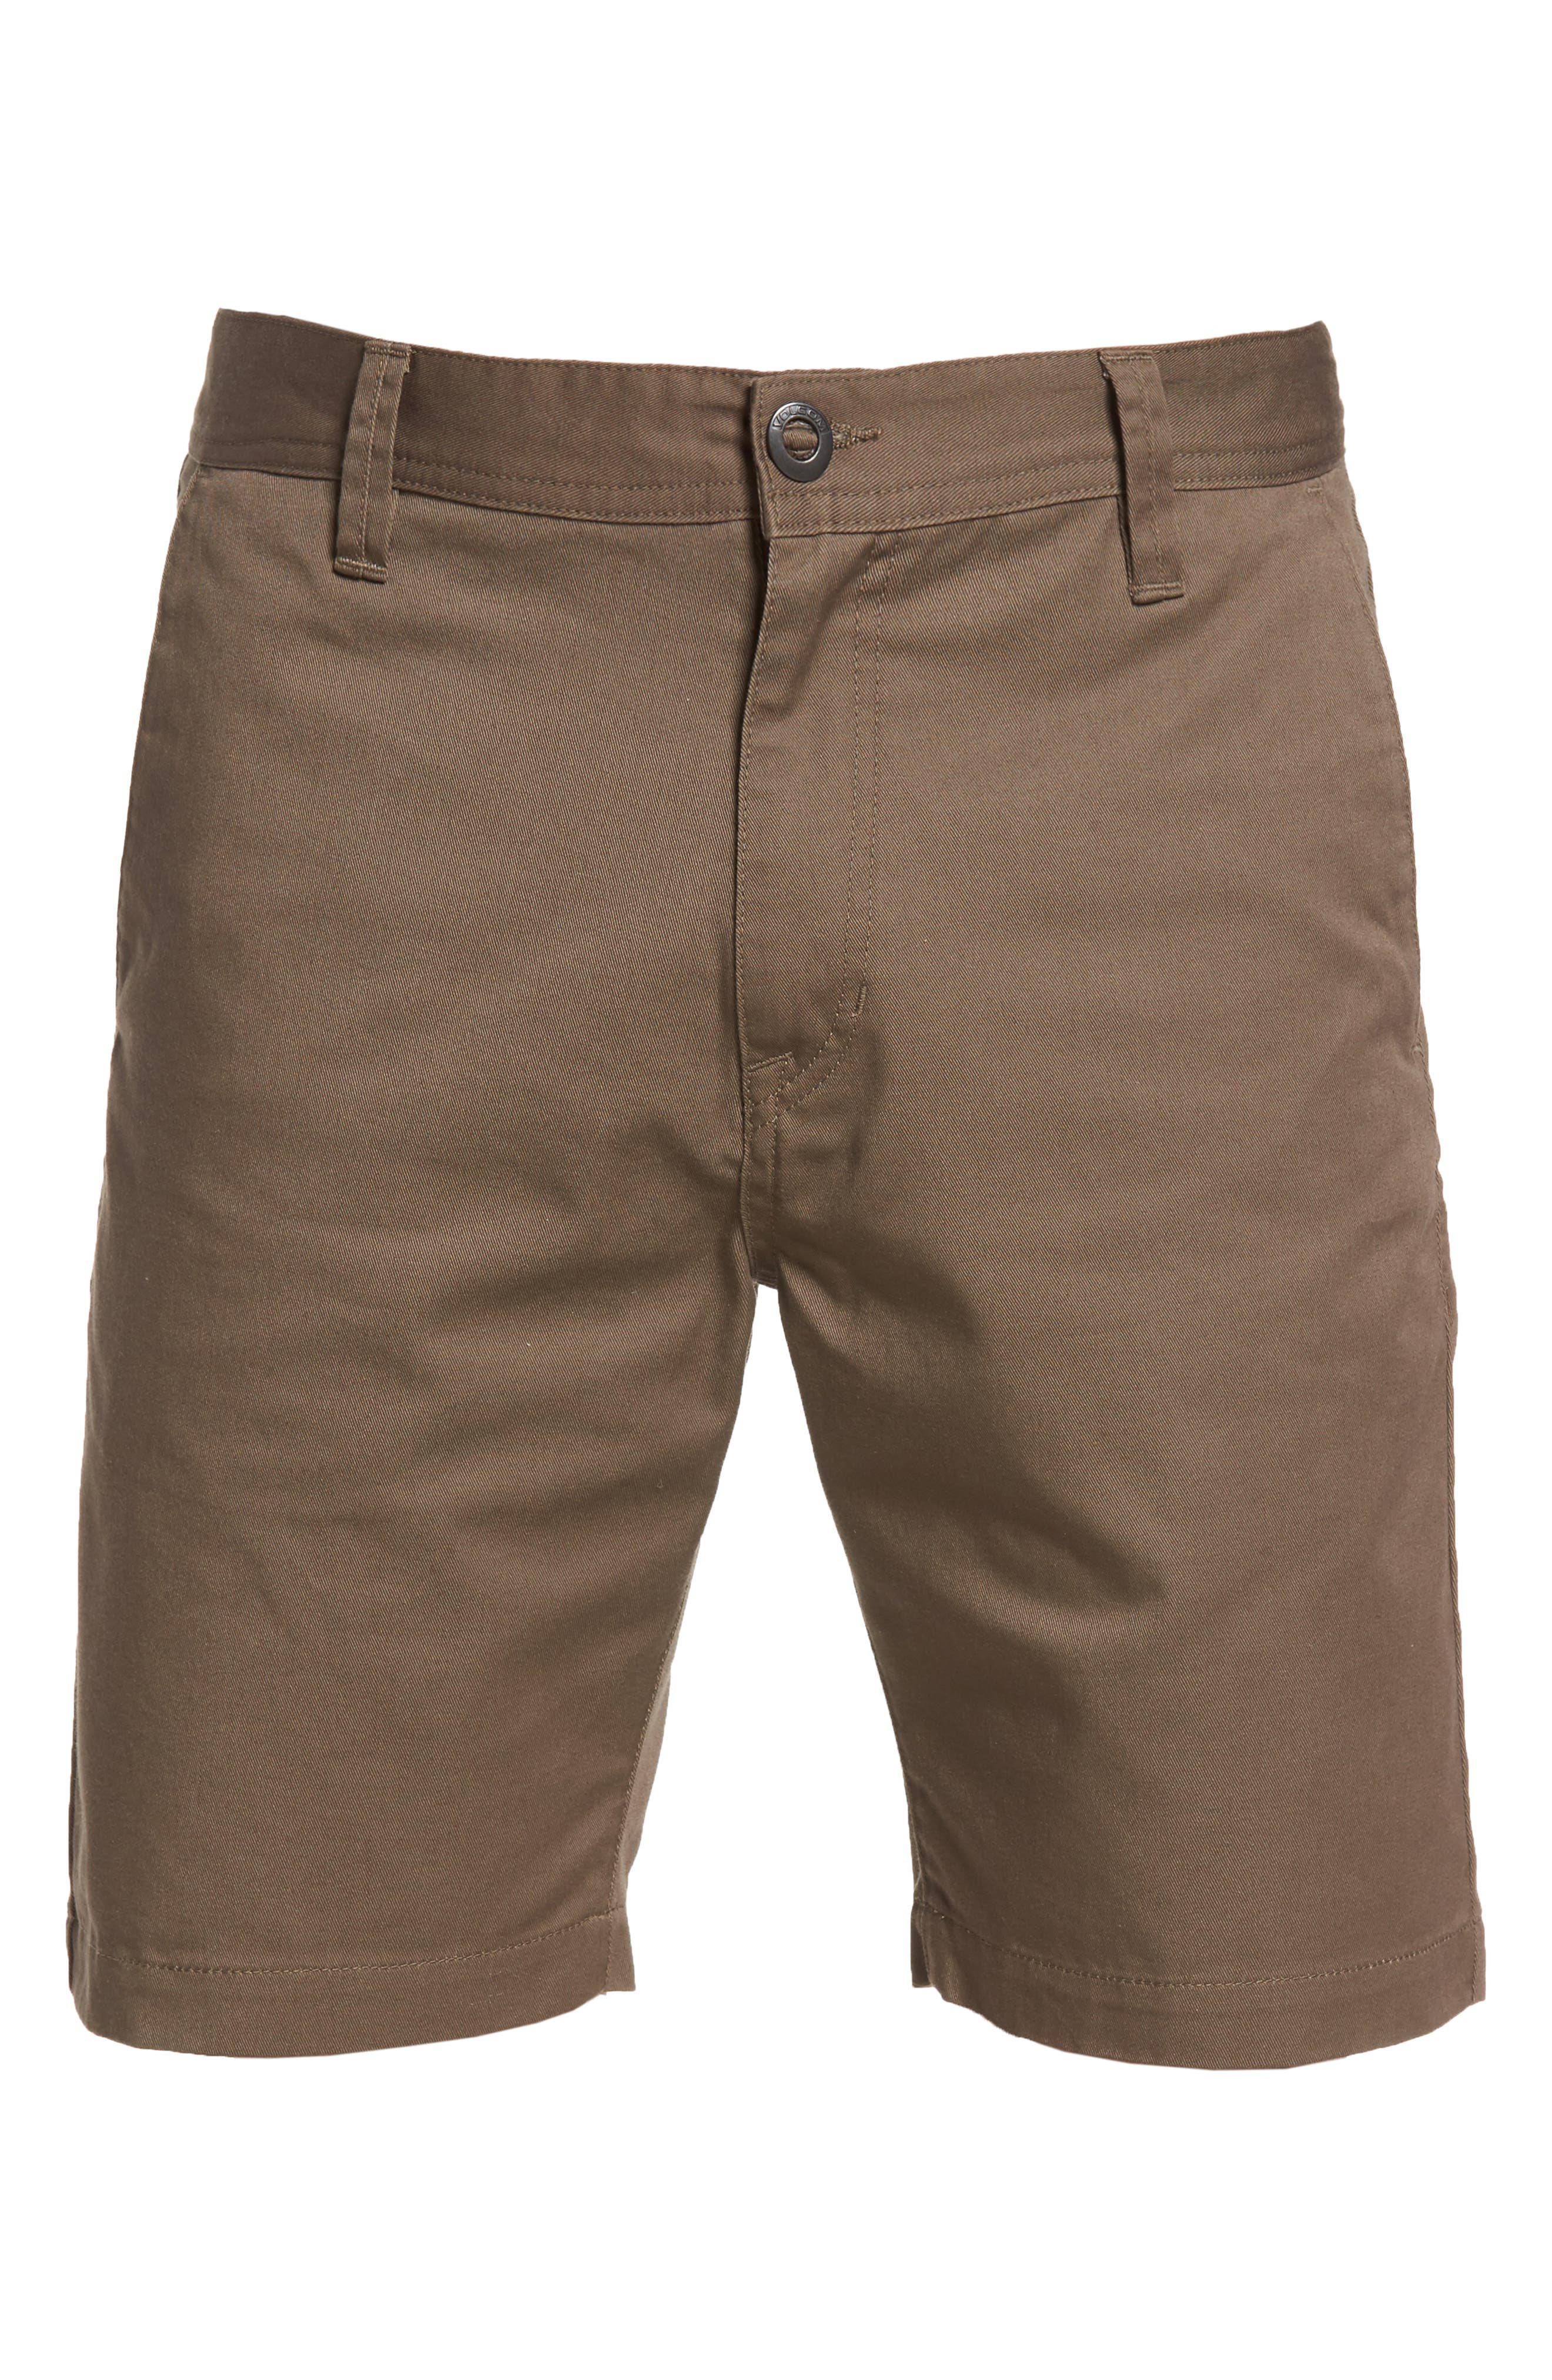 Drifter Modern Chino Shorts,                             Alternate thumbnail 6, color,                             Mushroom